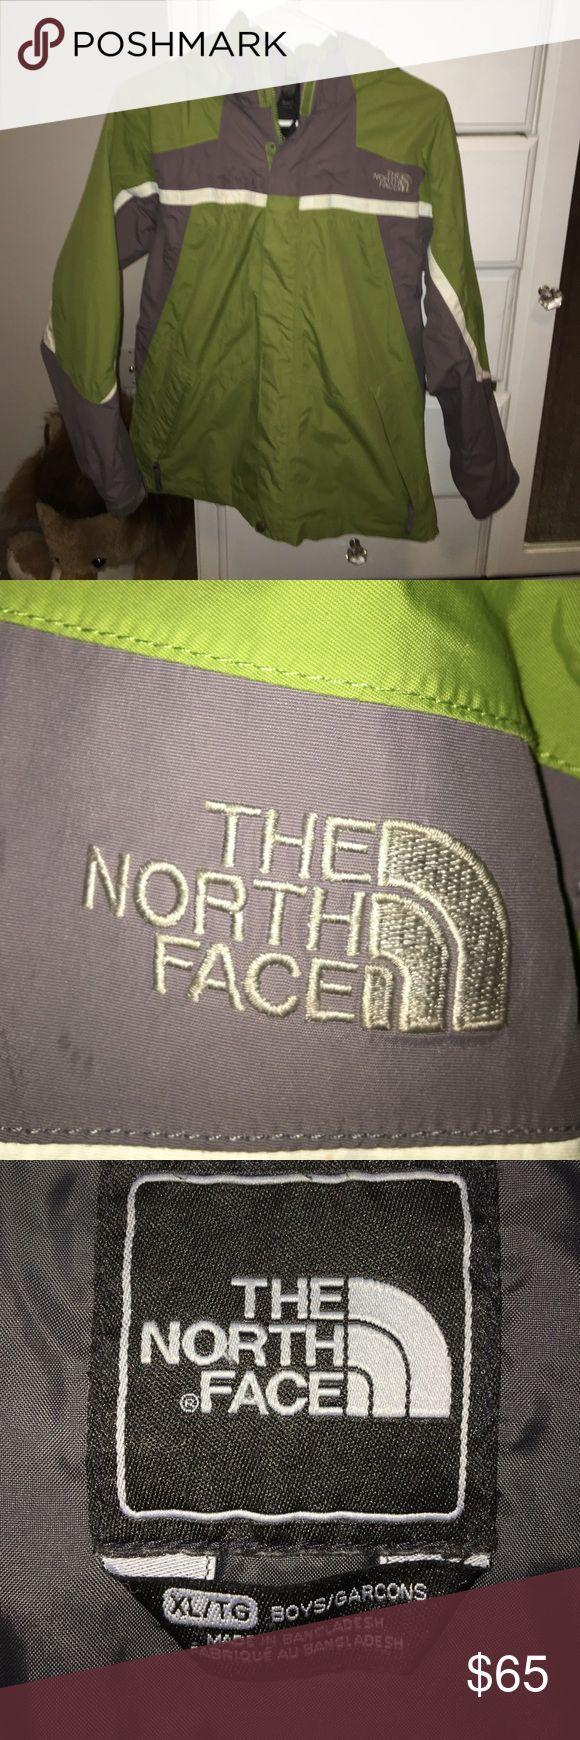 North Face rain jacket Olive green North Face rain jacket. Kids boys XL fits like a women's Medium North Face Jackets & Coats Raincoats